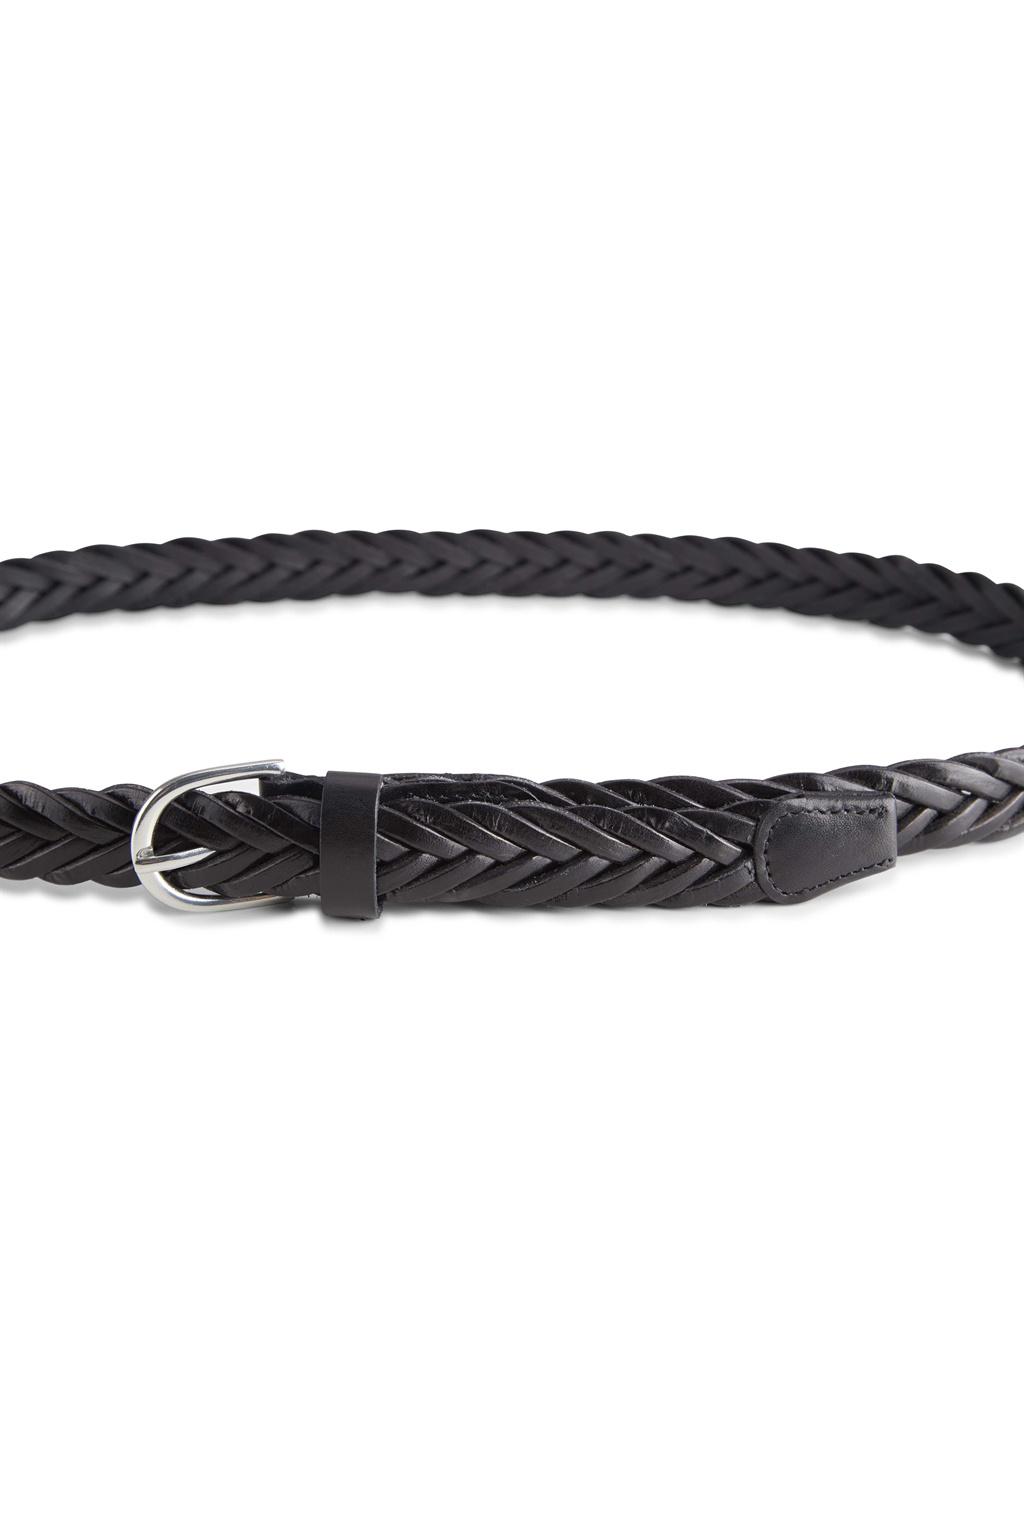 Nerea Leather Belt - Black-3